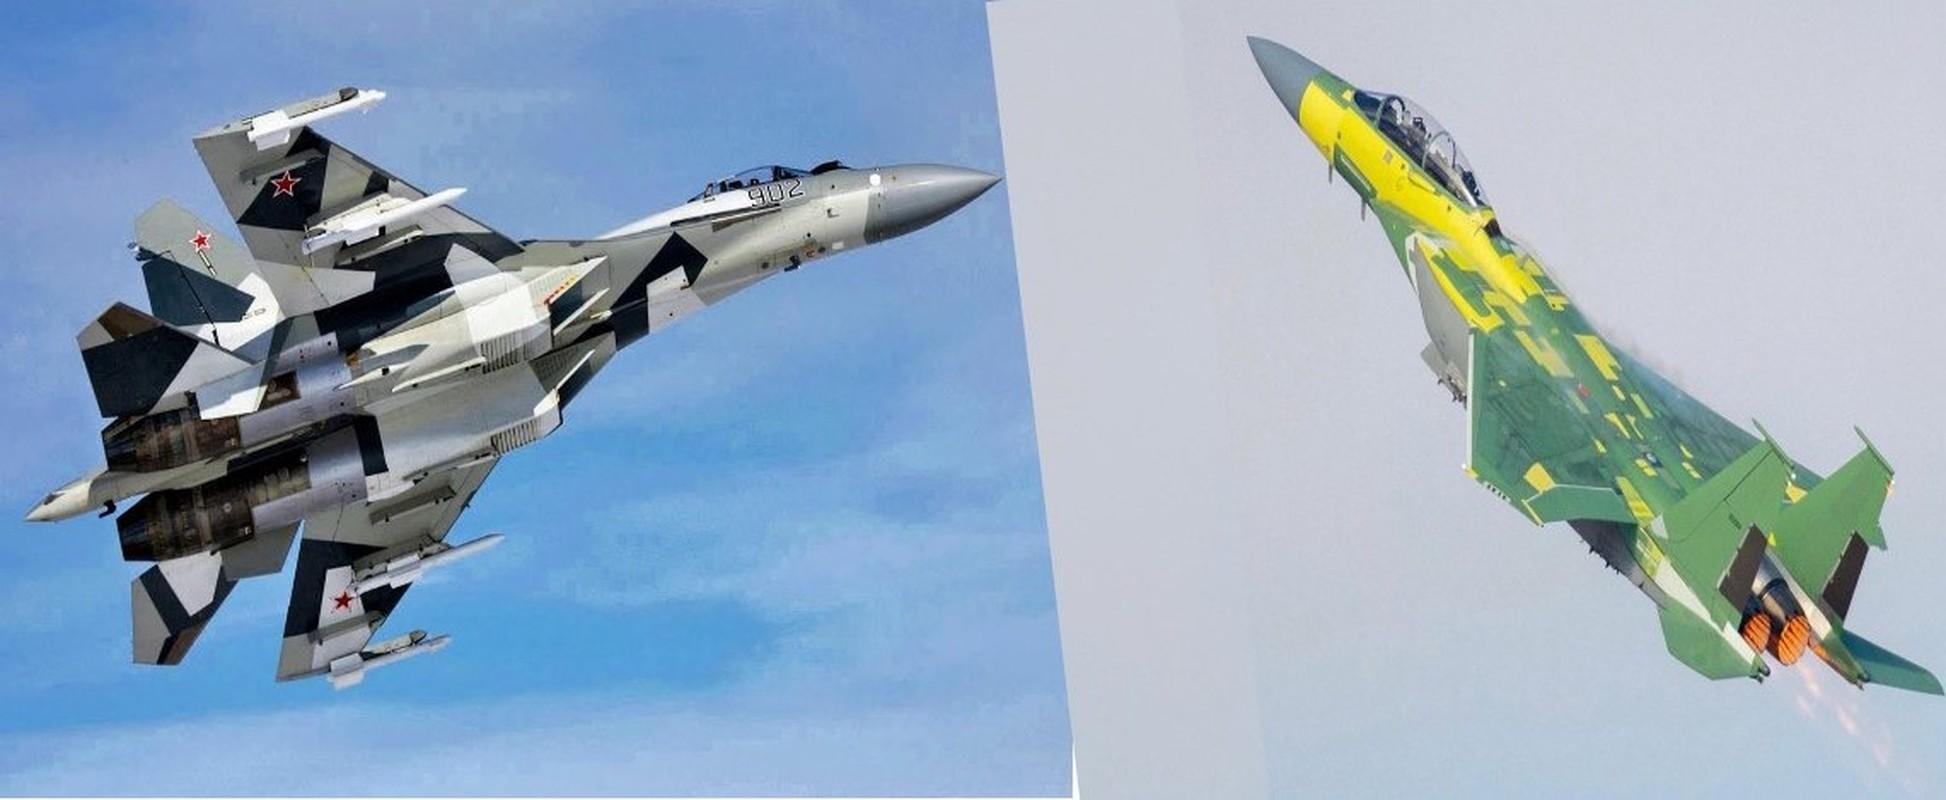 Su-35 cua Nga dau voi F-15EX cua My: Cuoc chien cua the he 4++-Hinh-16